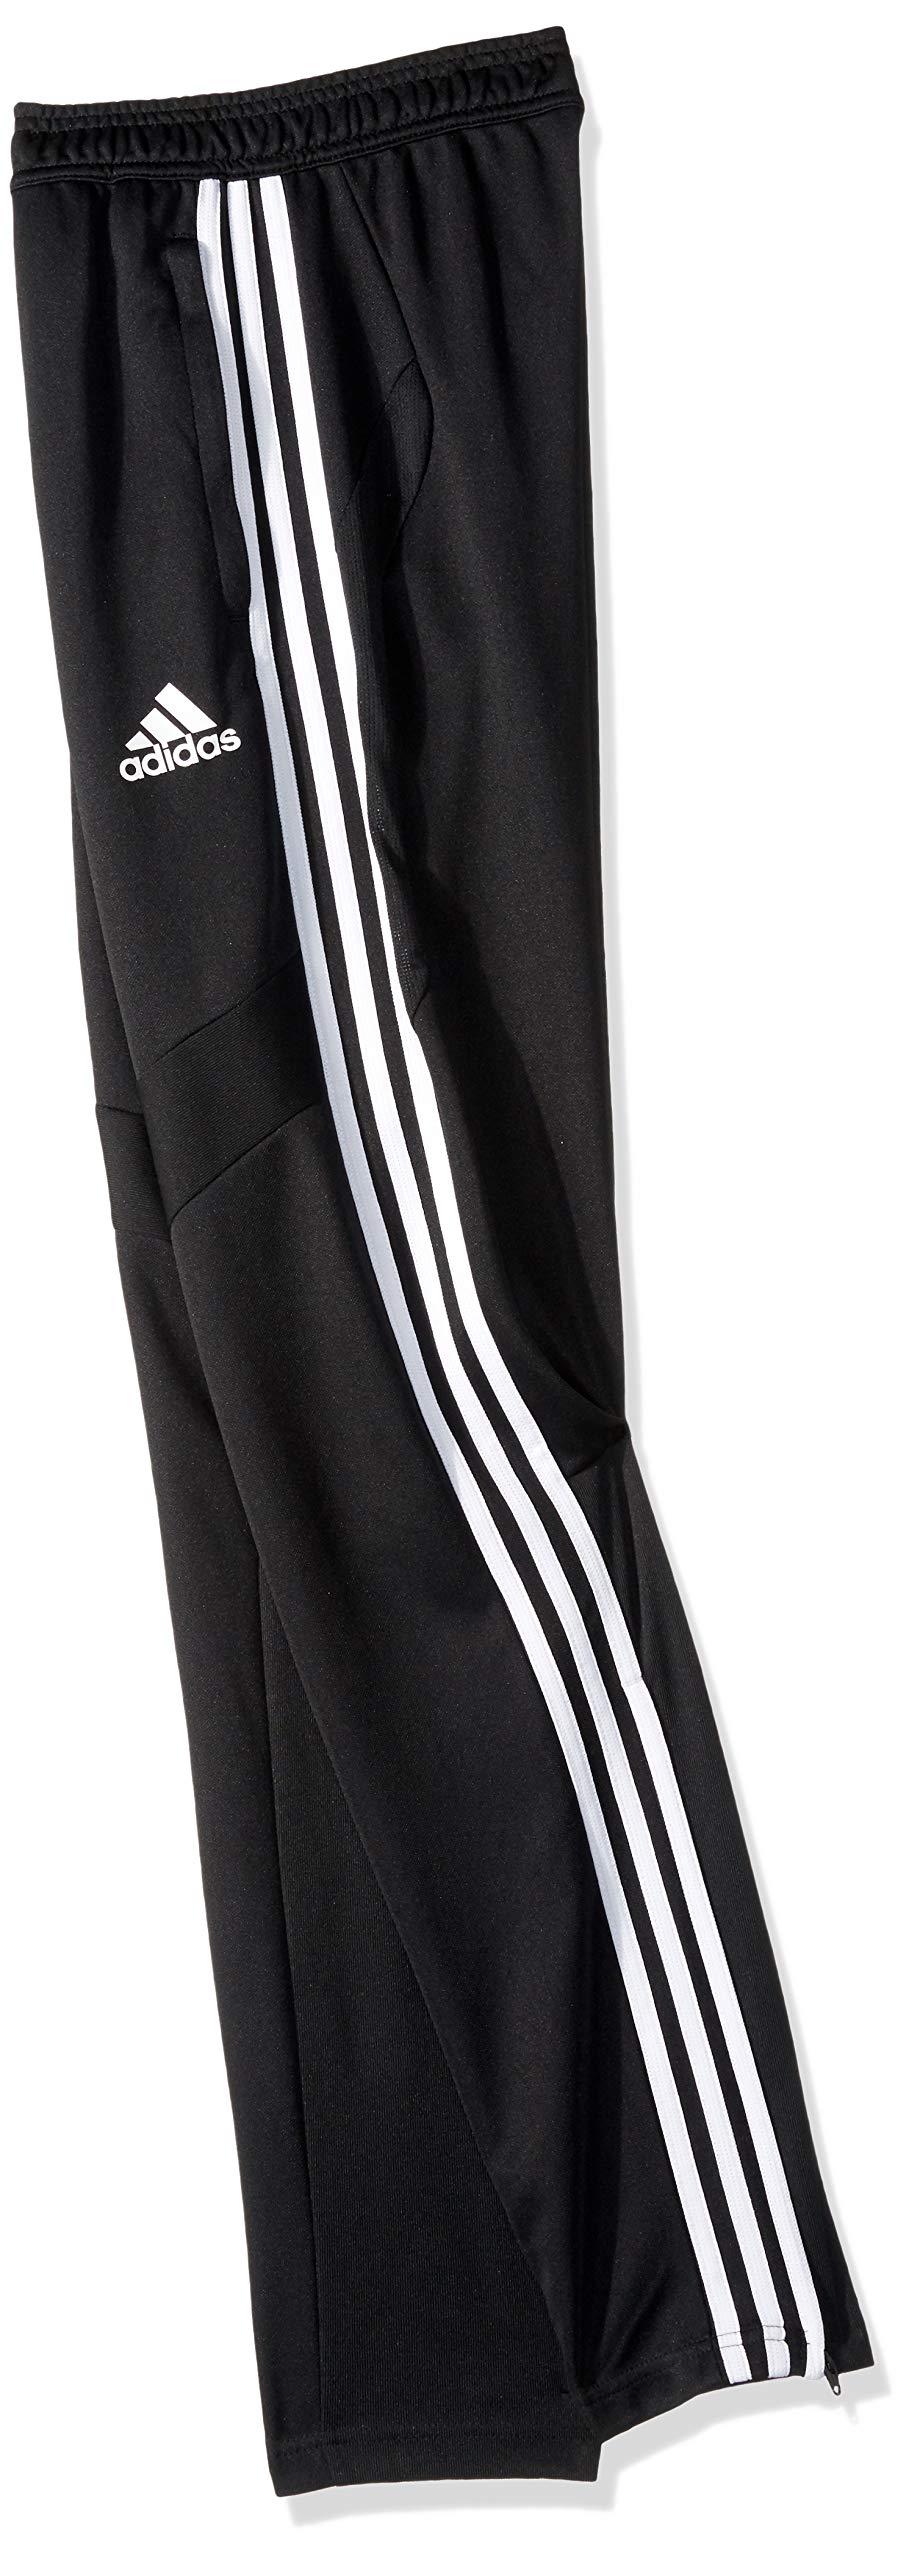 adidas Youth Tiro19 Youth Training Pants, Black/White, XX-Small by adidas (Image #3)